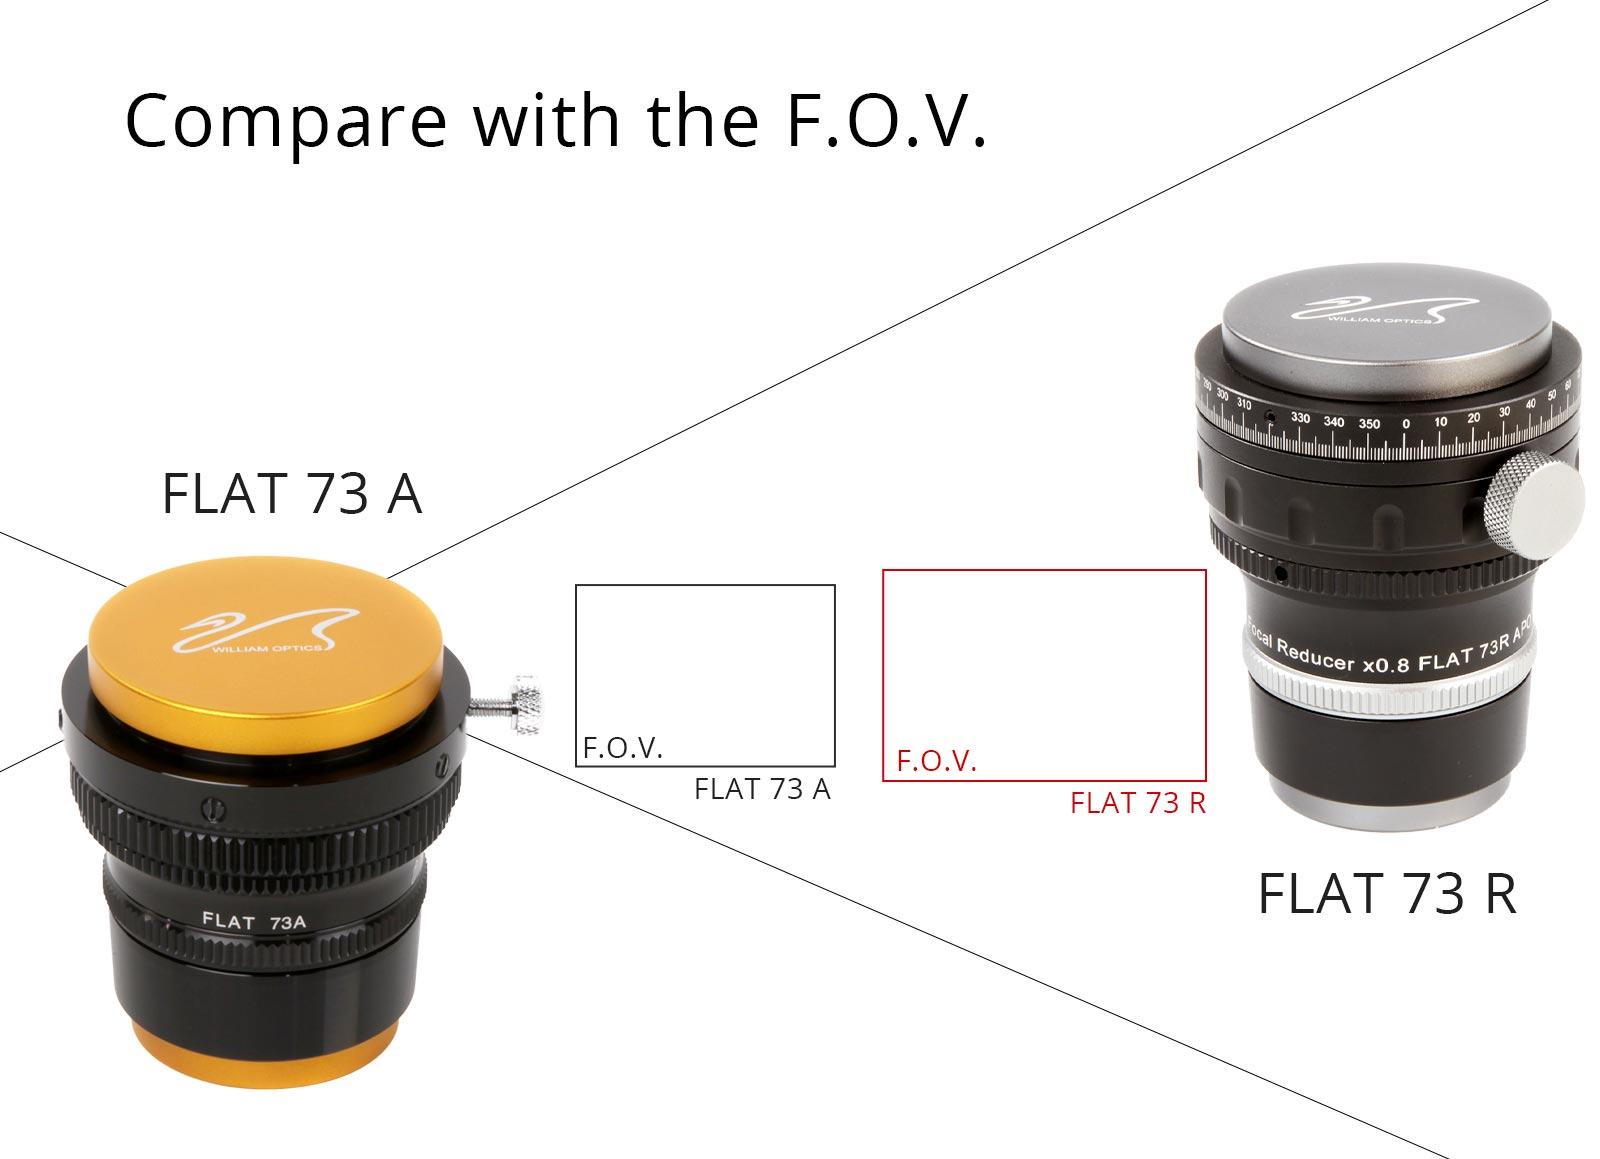 flat-73-r-3.jpg